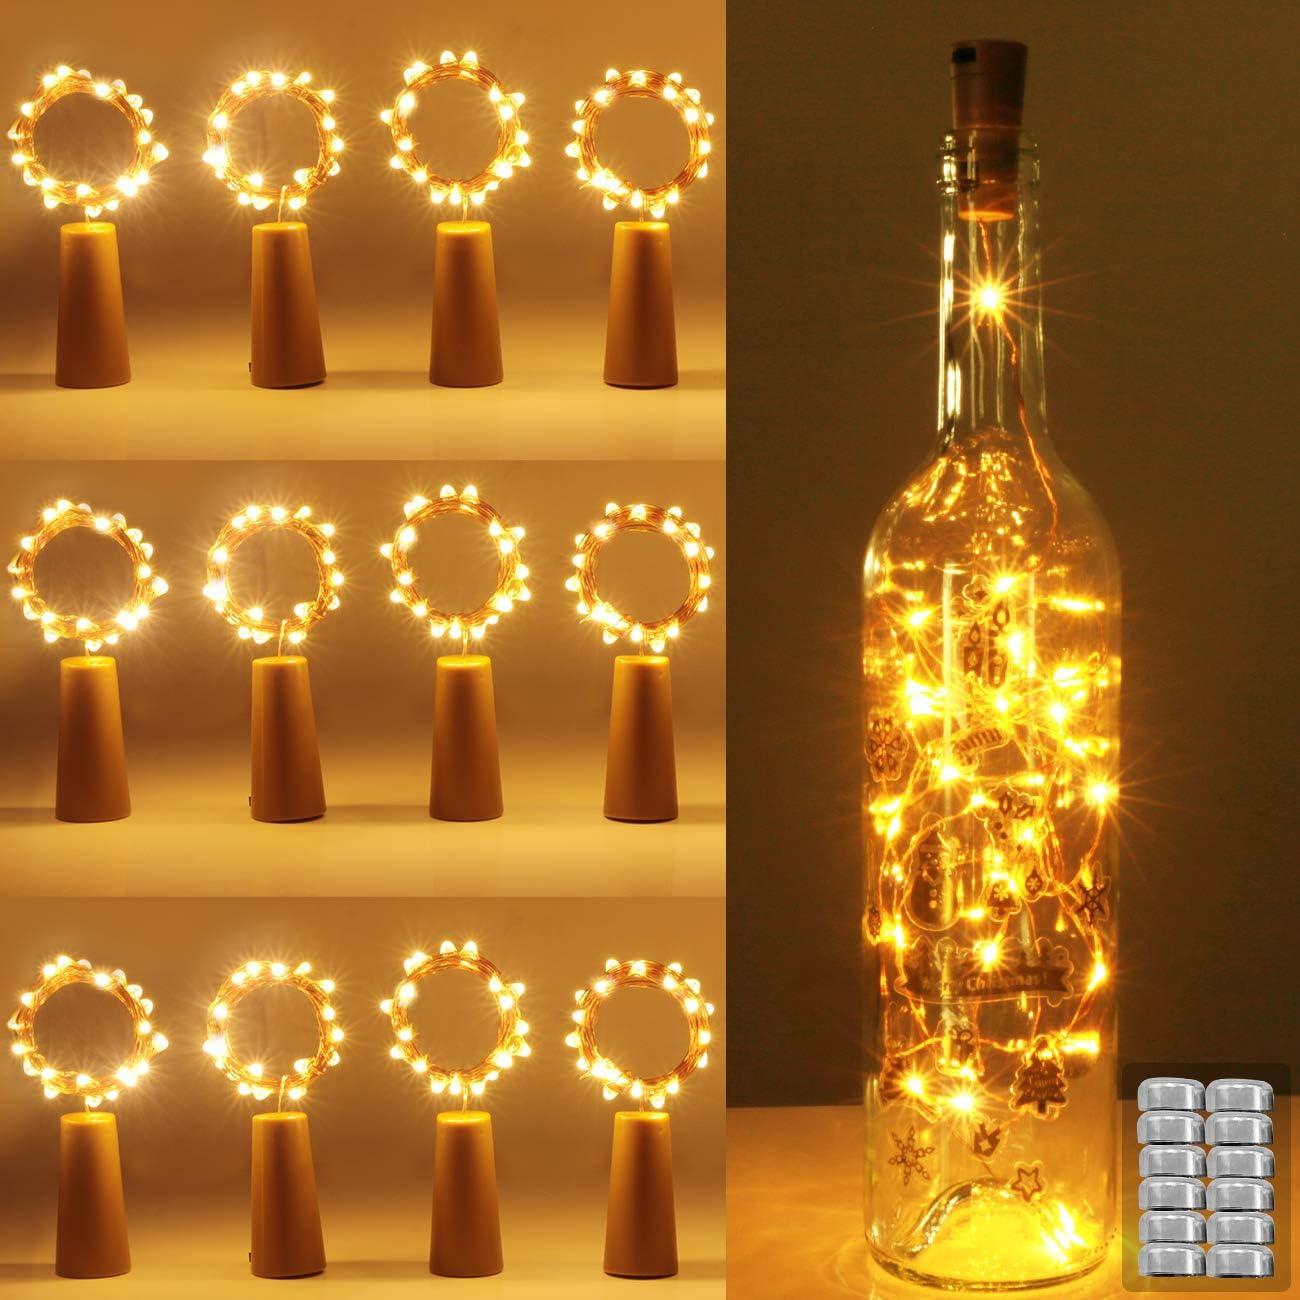 luz de Botella, Kolpop luz Corcho, luces led para Botellas de Vino 2m 20 LED a Pilas Decorativas Cobre Luz para Romántico Boda, Navidad, Fiesta, Hogar, Exterior, Jardín,Blanco Cálido(12 Pack): Amazon.es: Iluminación